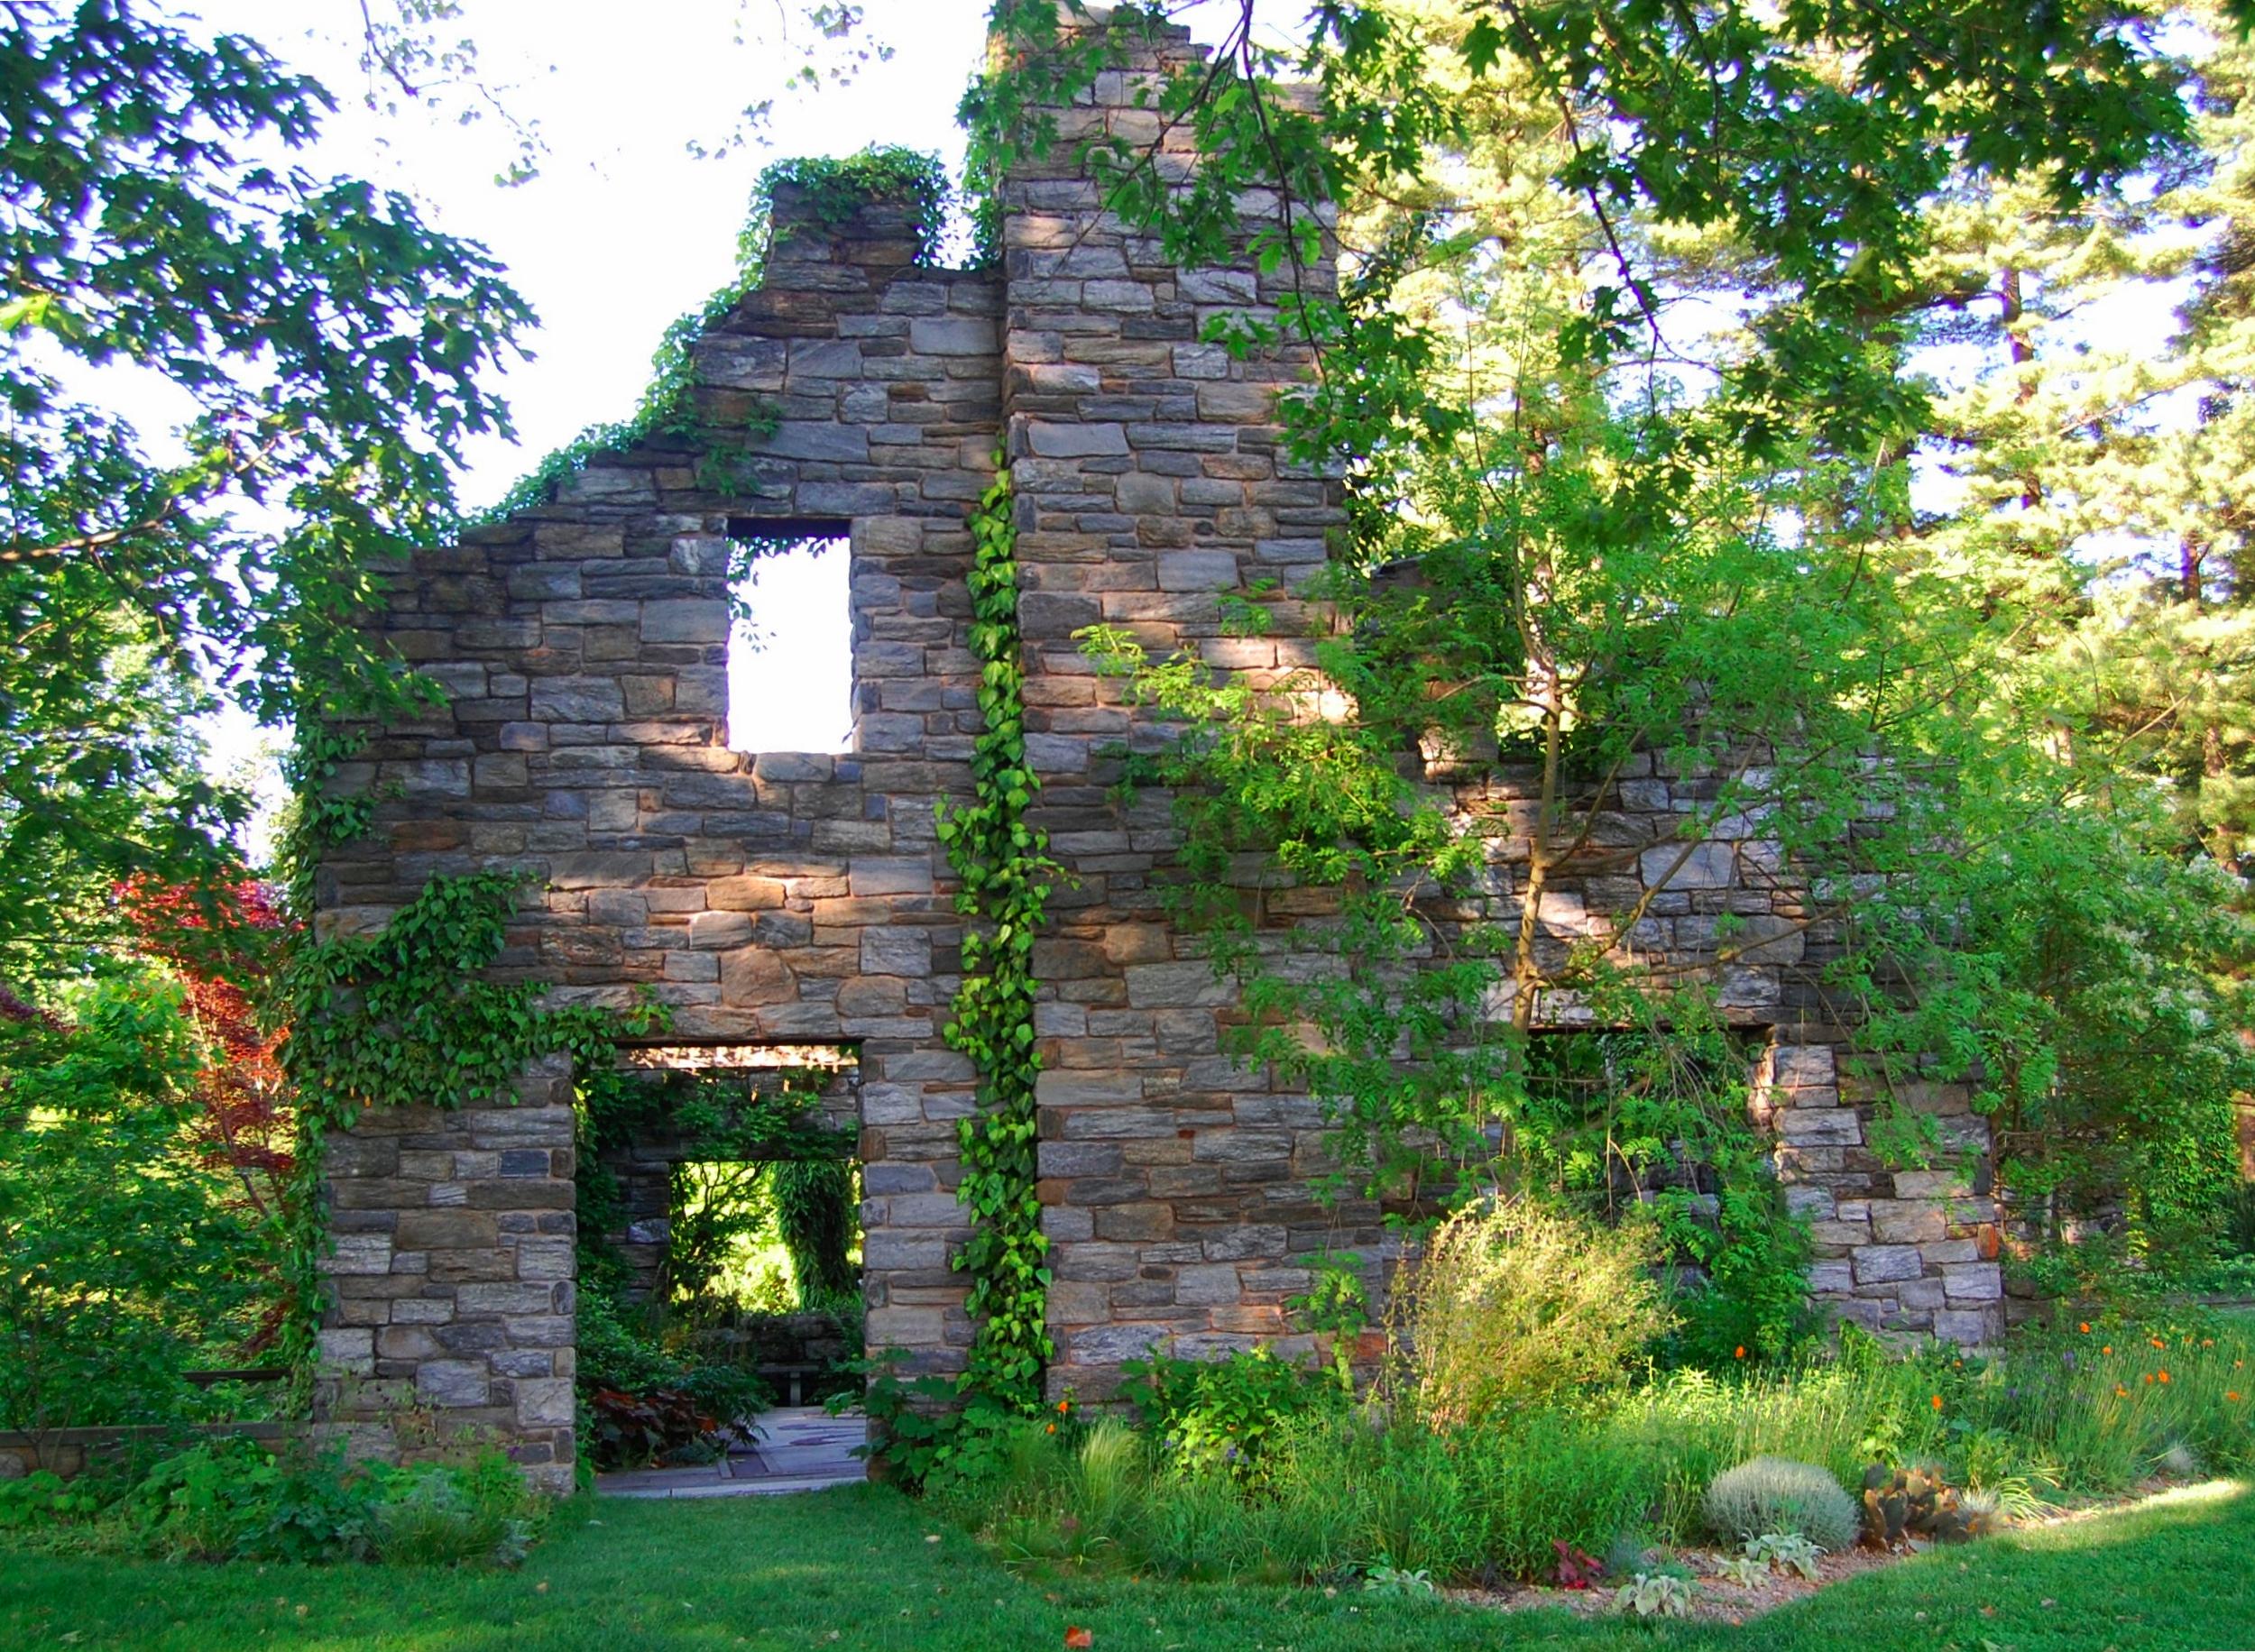 Quarry Shade Garden At Bon Air Park: Regional Gardens: Chanticleer Garden